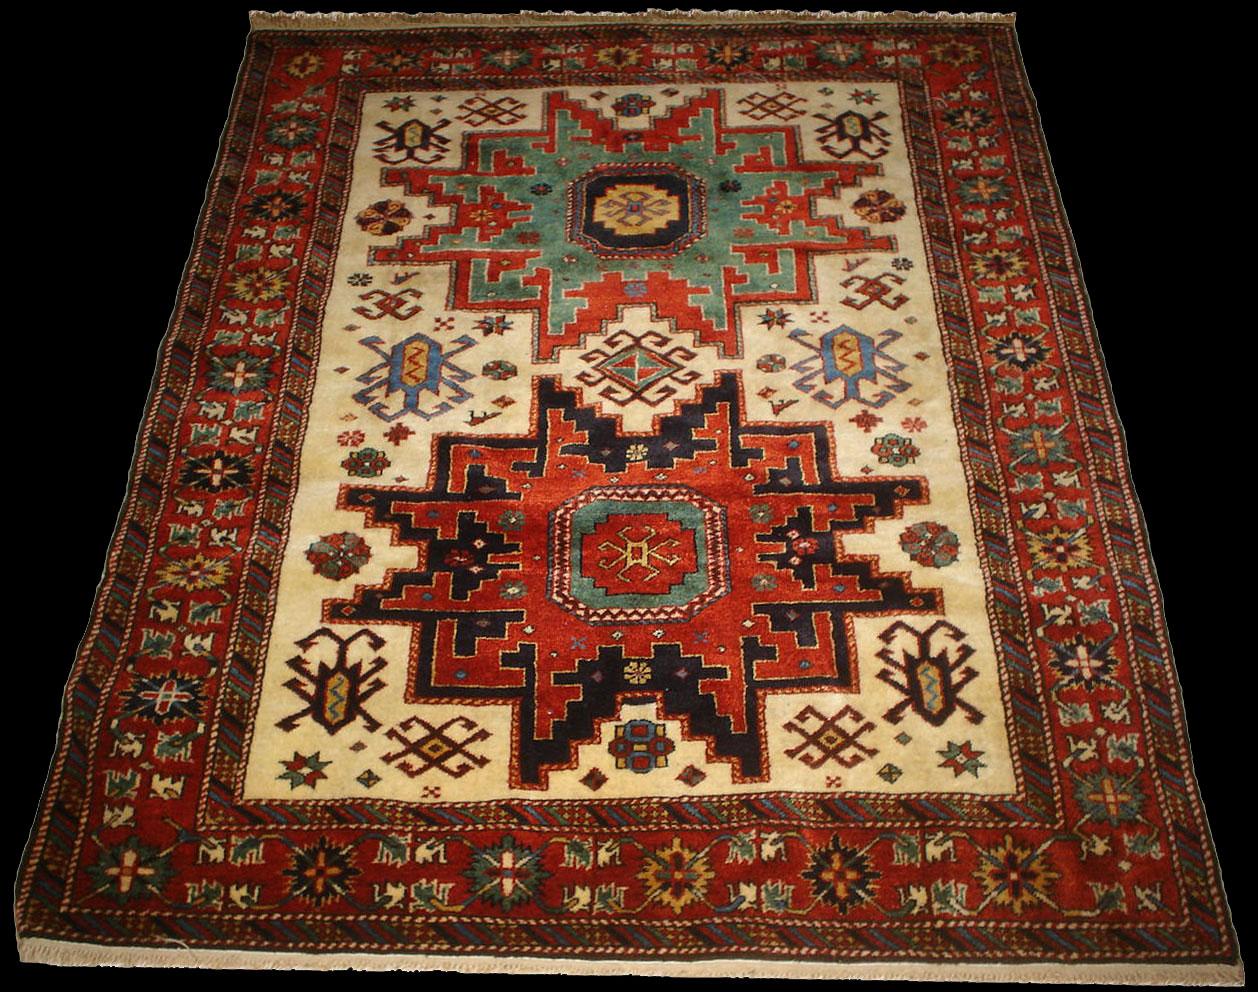 A Lesghi Star Rug Caucasian Zeyve Rug Azerbaijan Pure